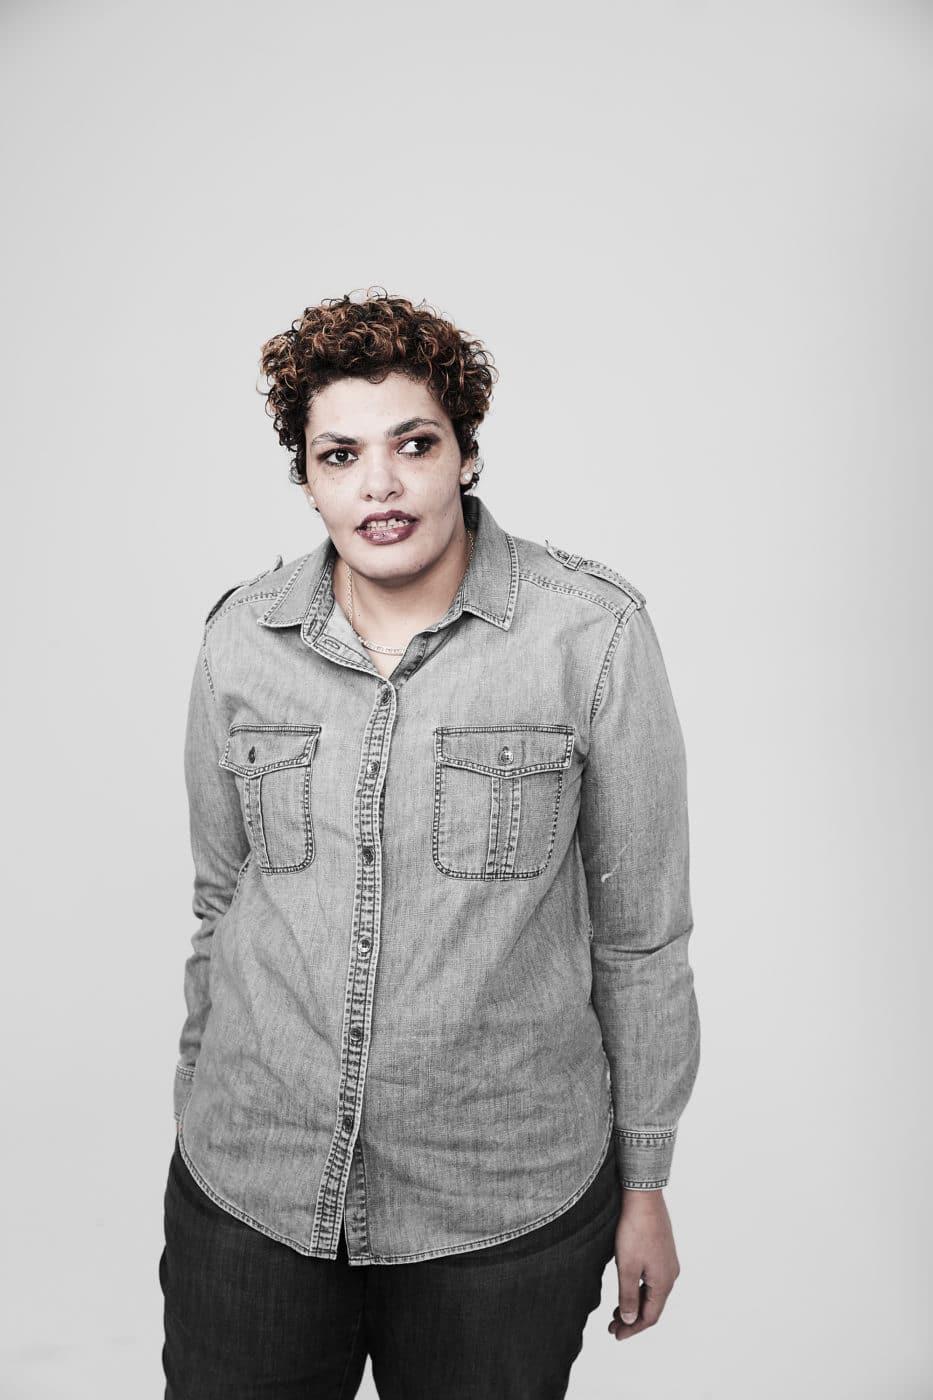 Yadira Portrait